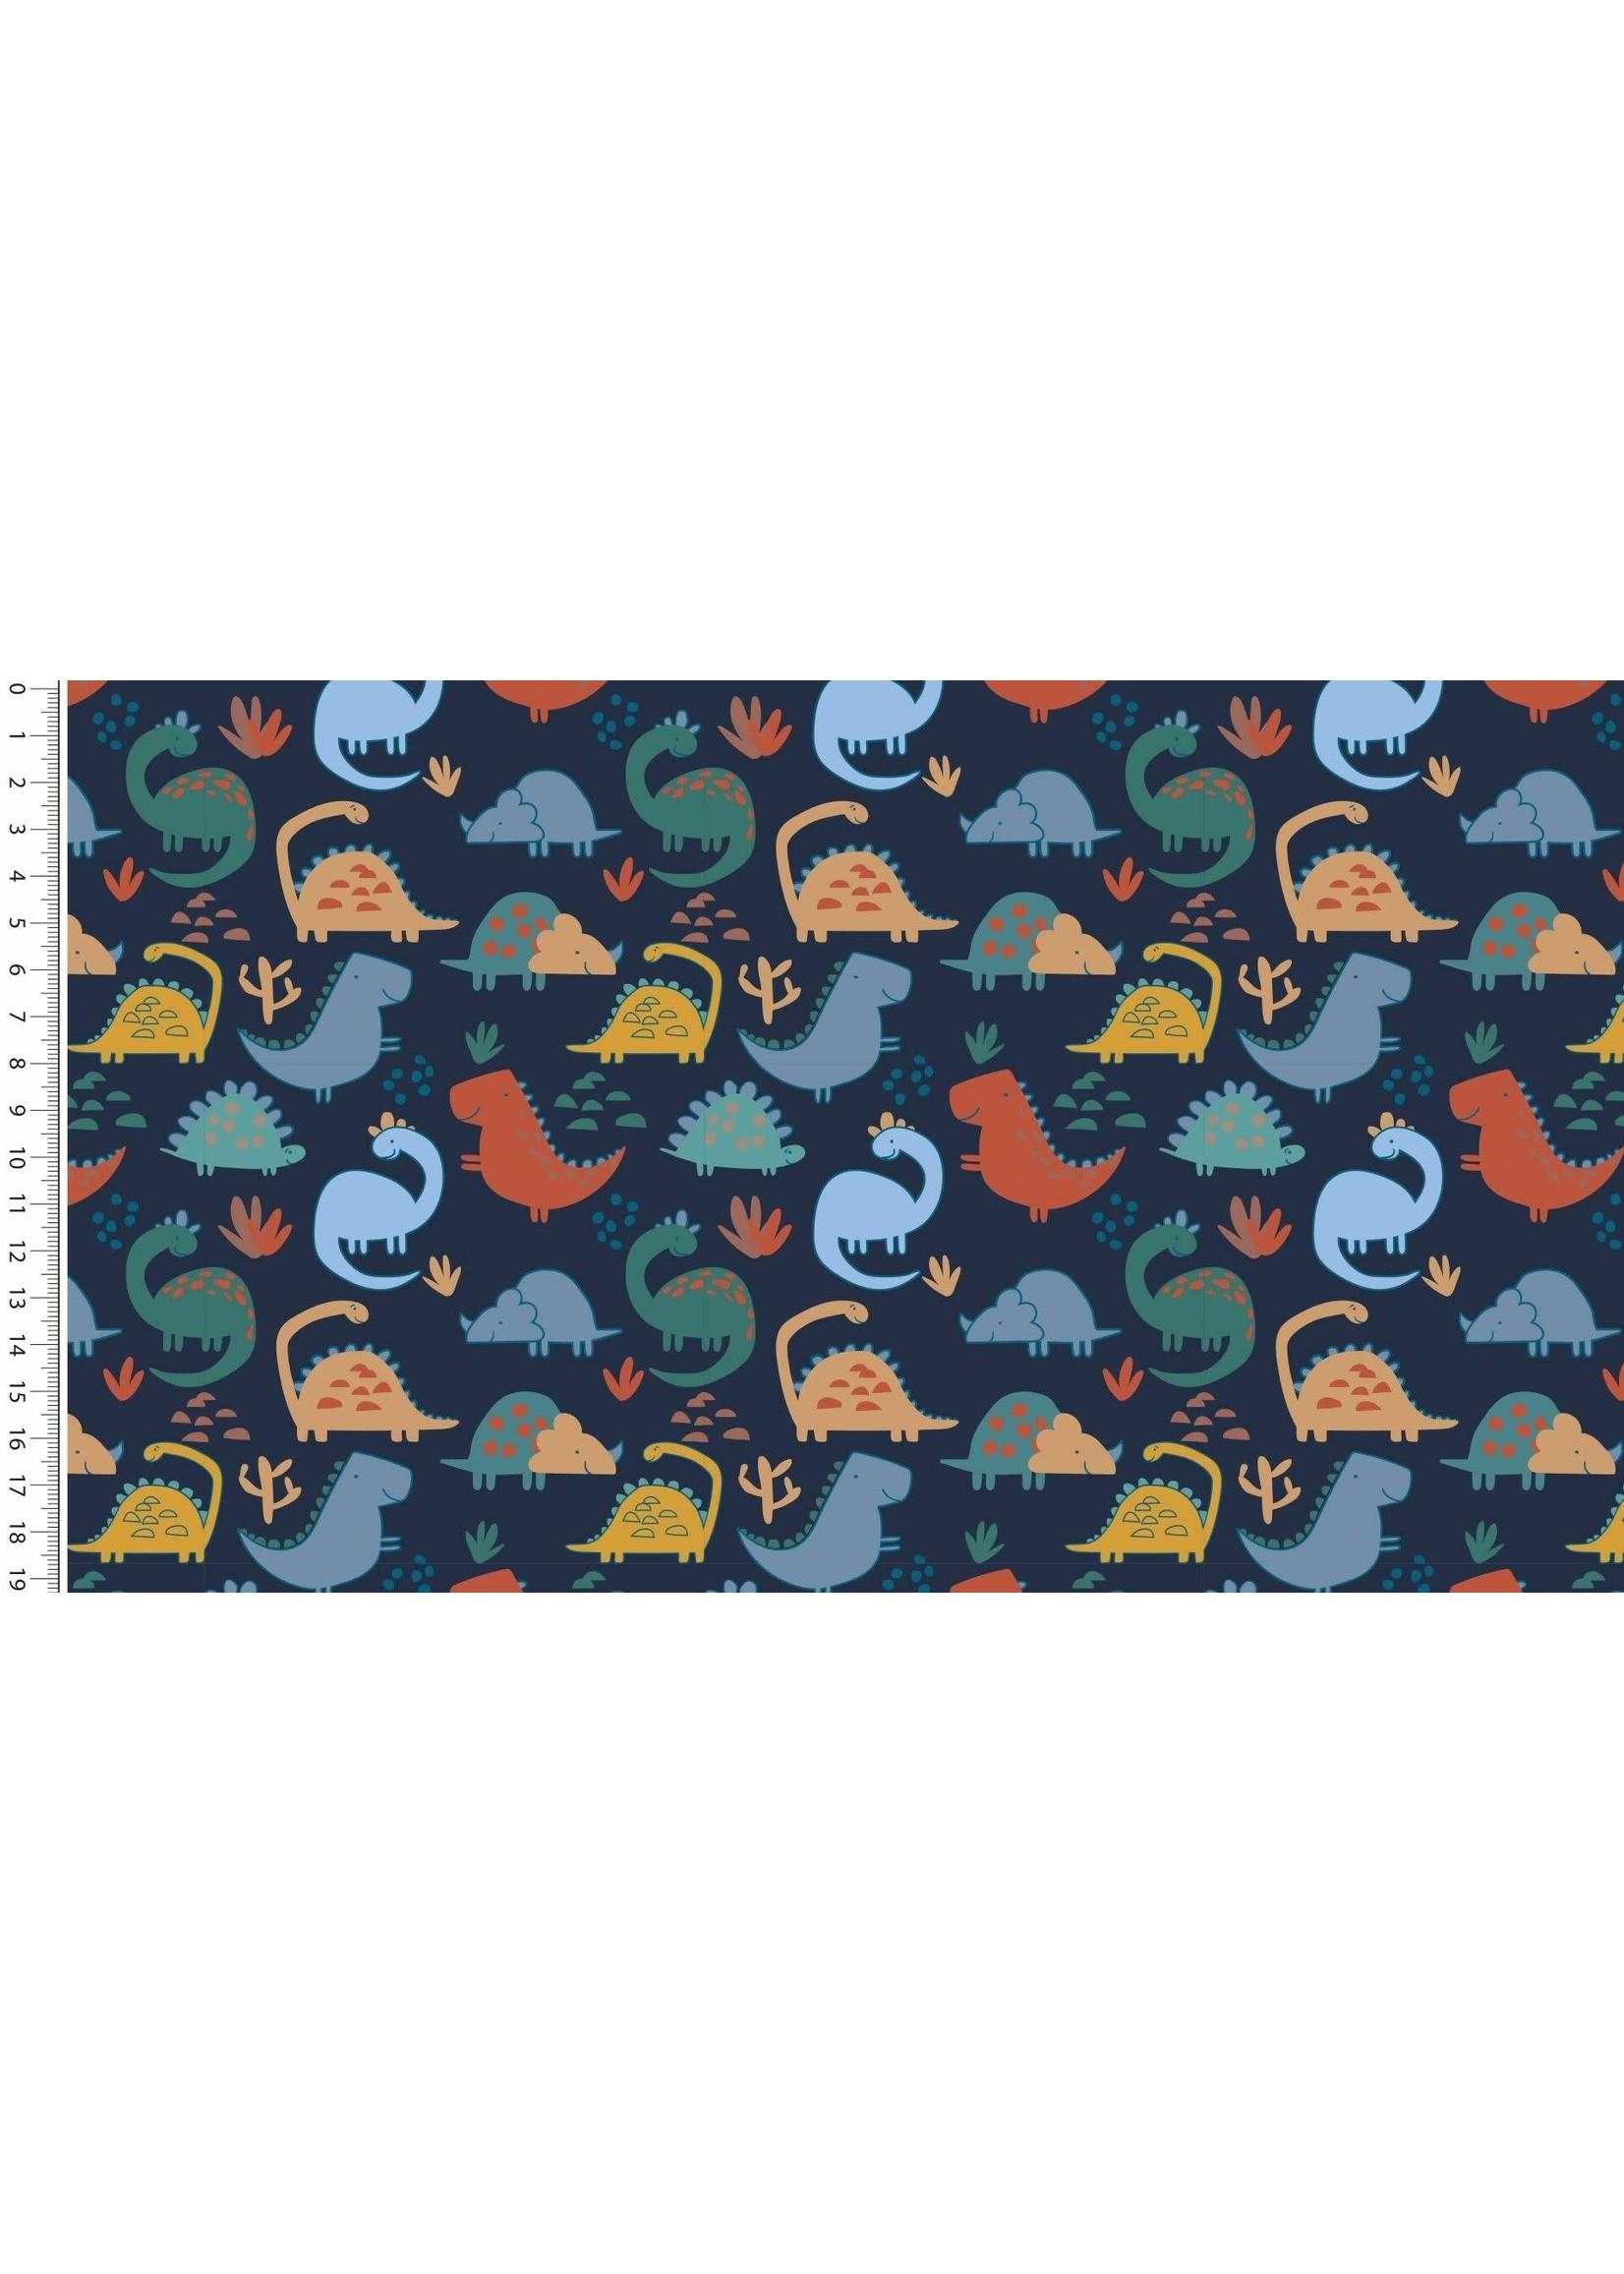 Mutsaers Textiles FT Brushed Happy Dino